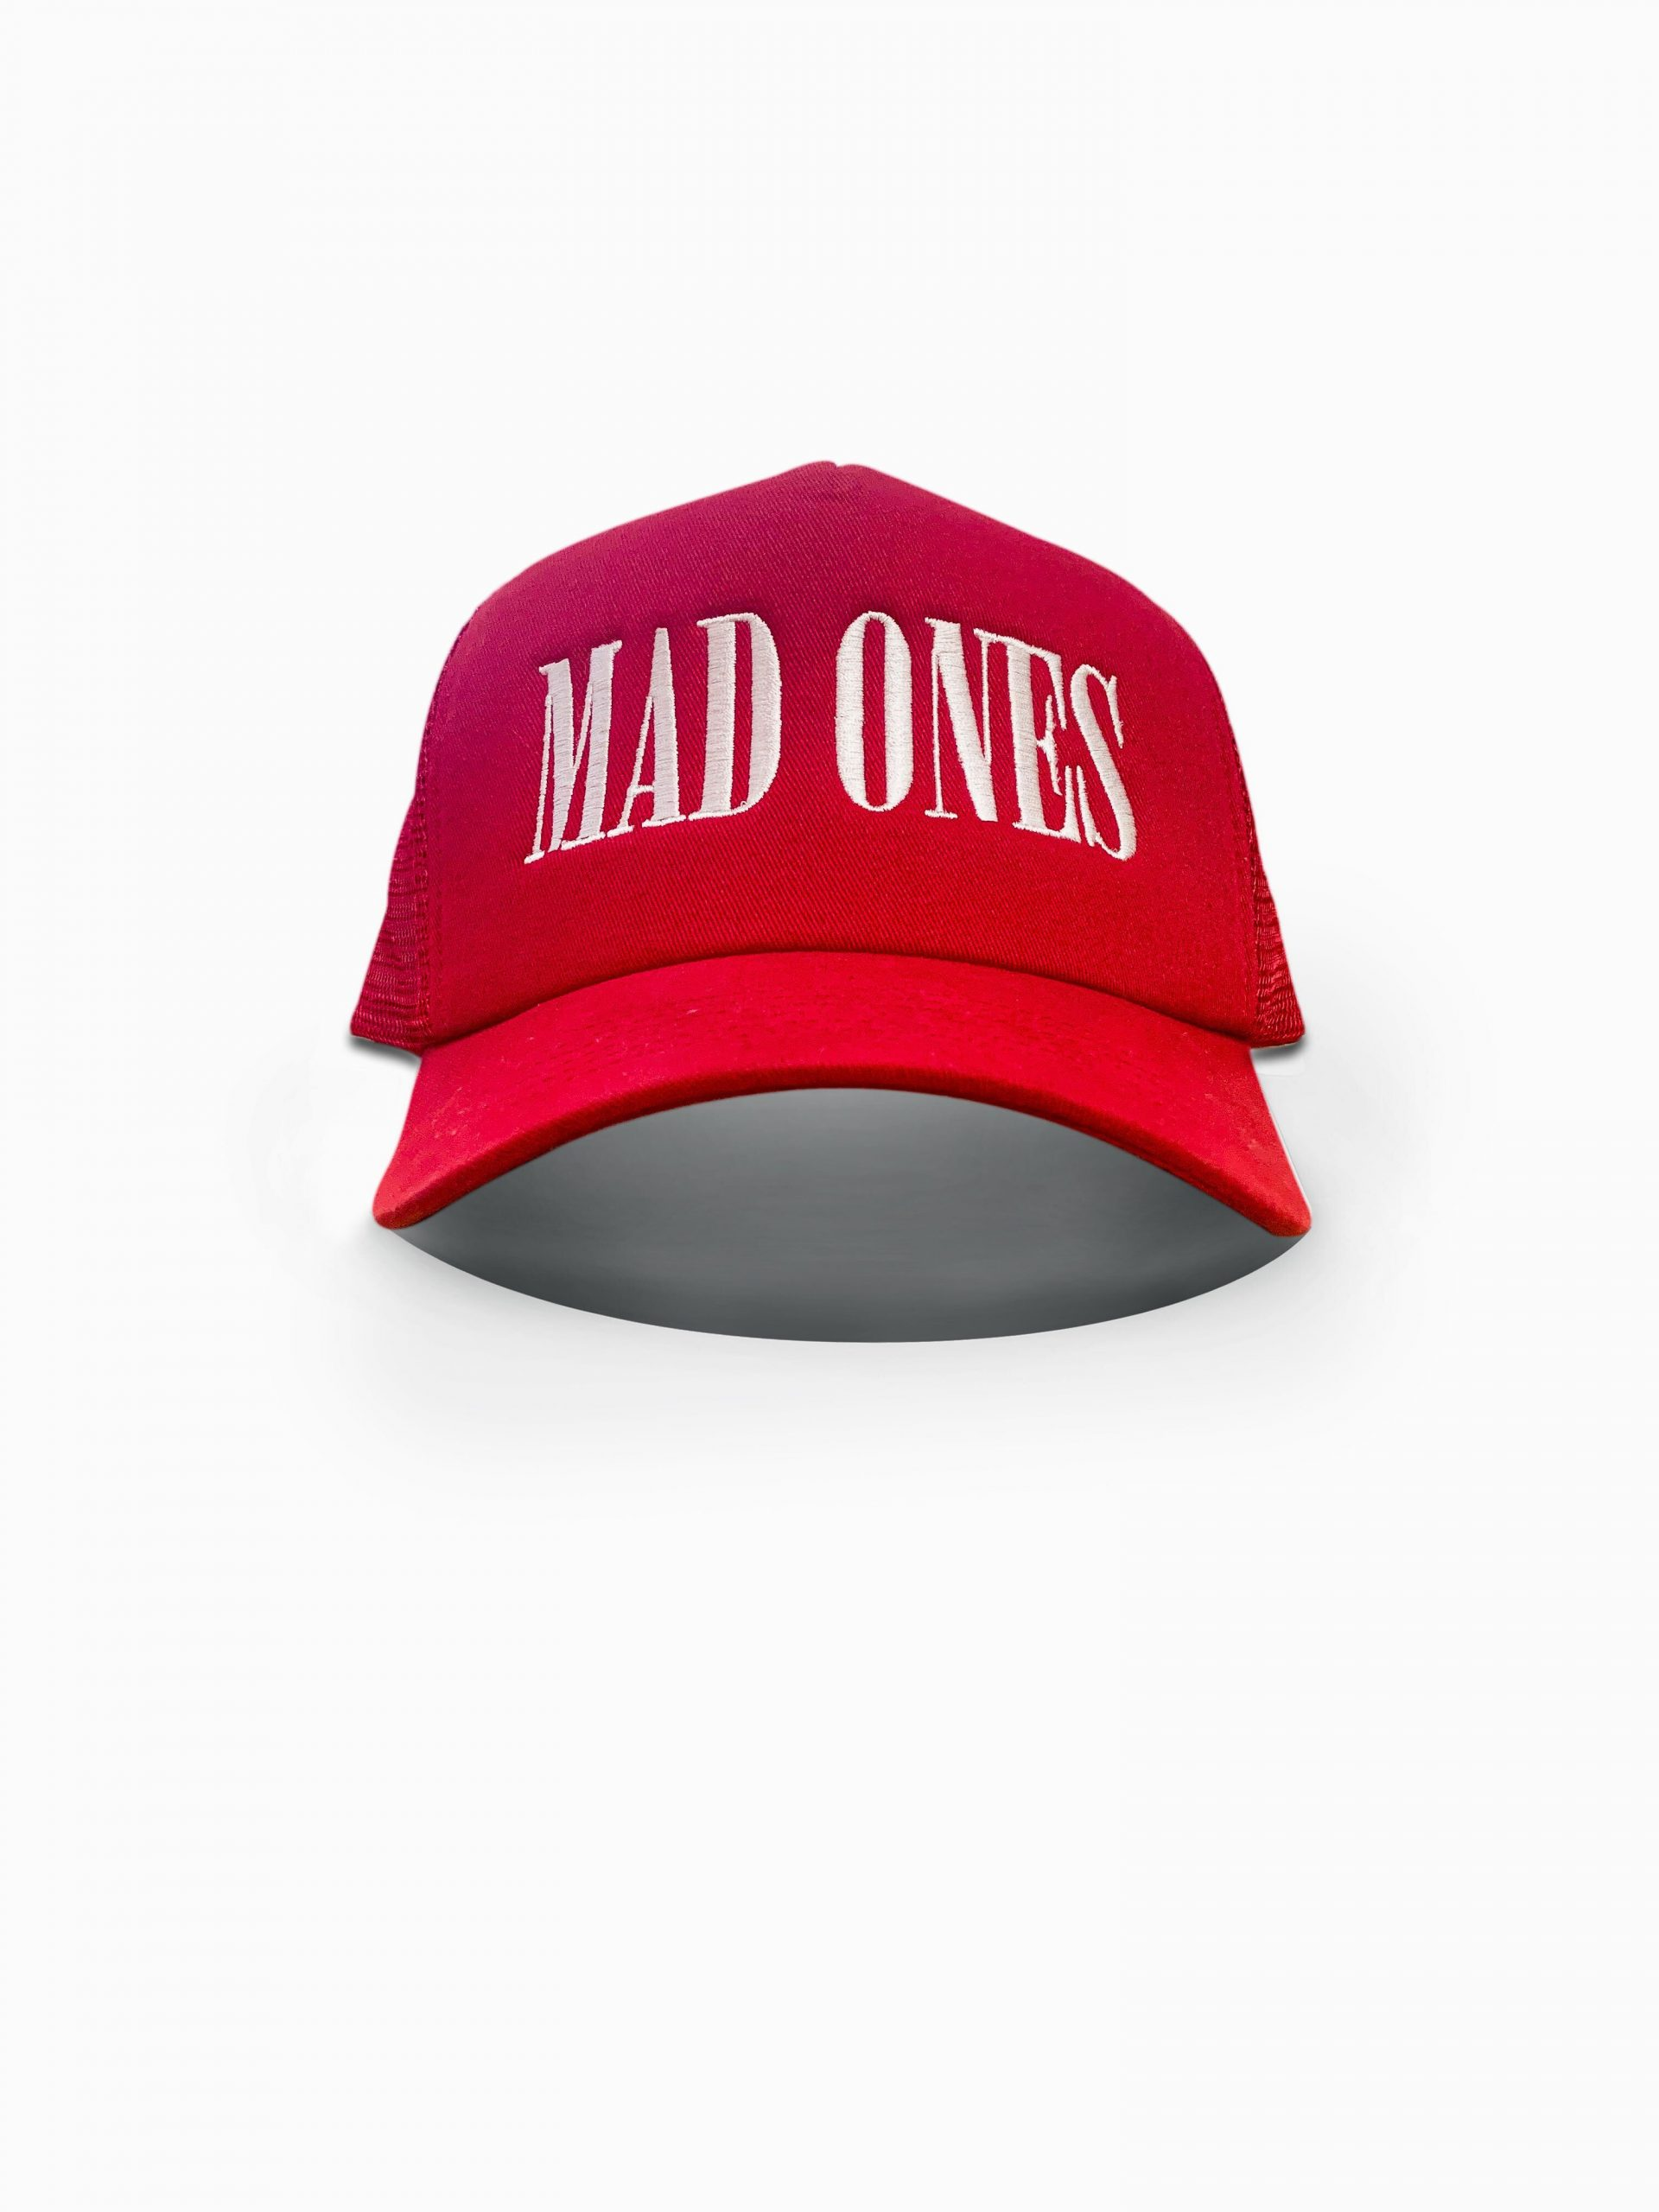 Mad Ones Trucker Hat Red